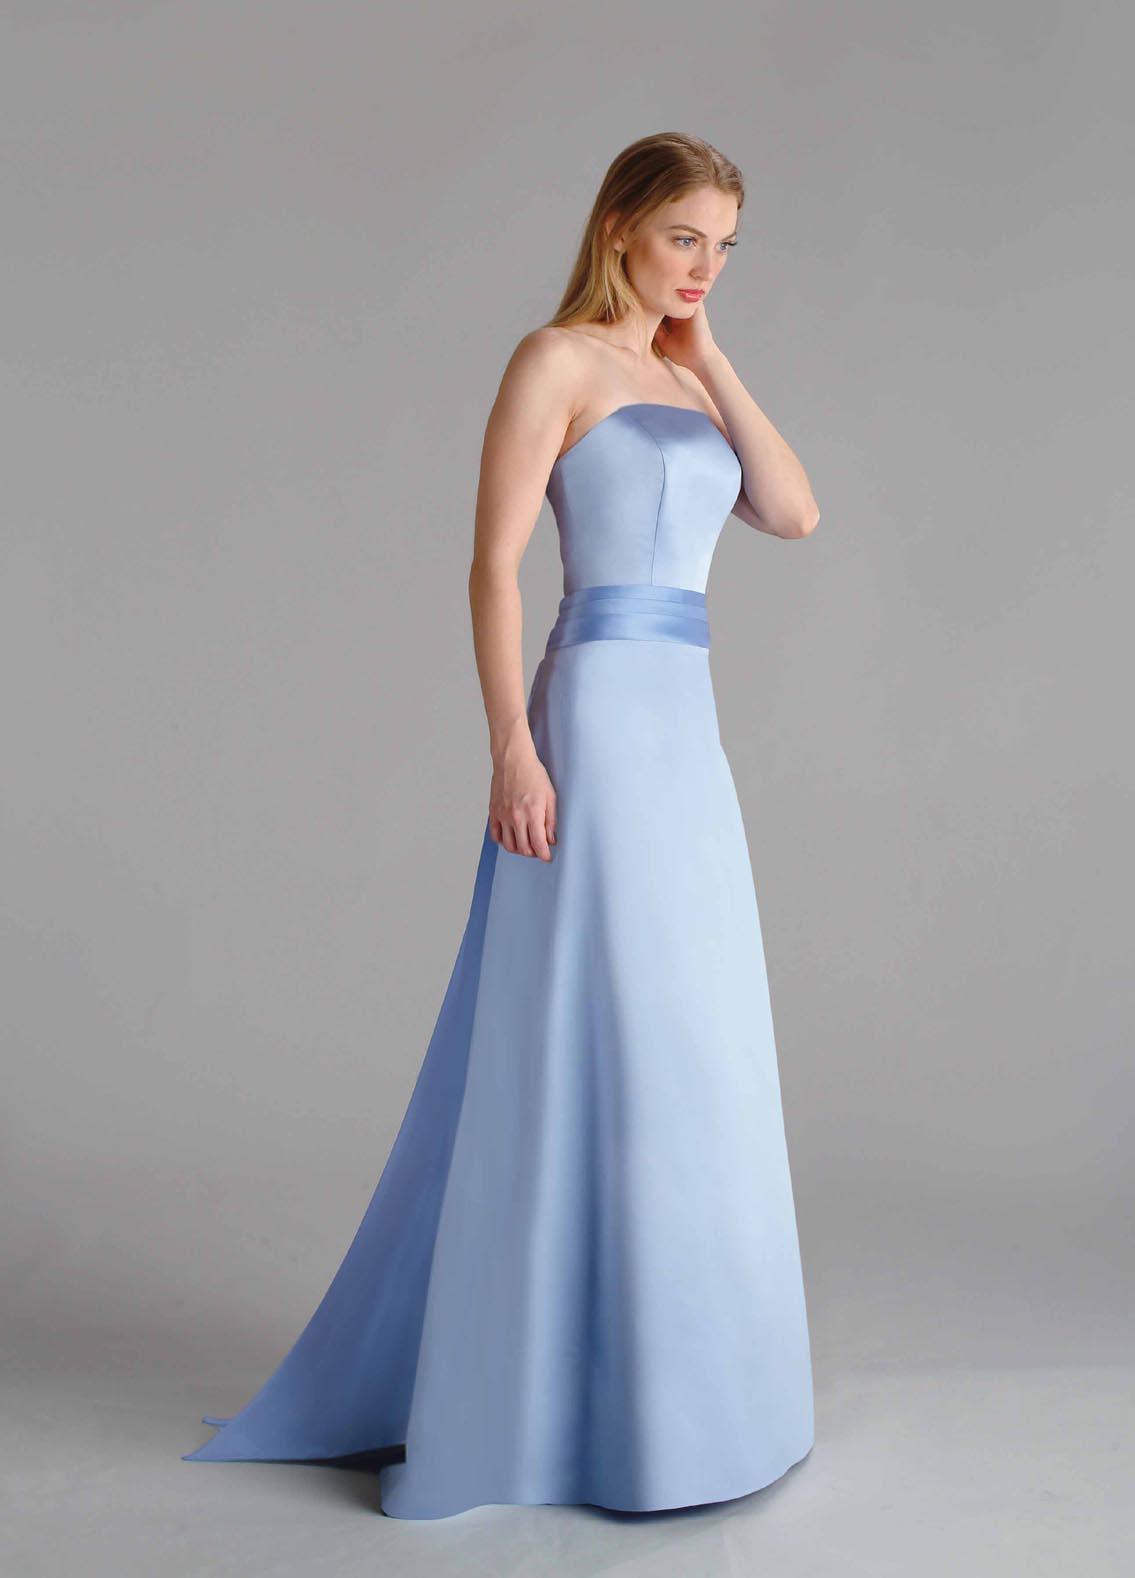 Amazing bridesmaid dress by anne bridal design picture 3 wedding amazing bridesmaid dress by anne bridal design picture 3 ombrellifo Choice Image